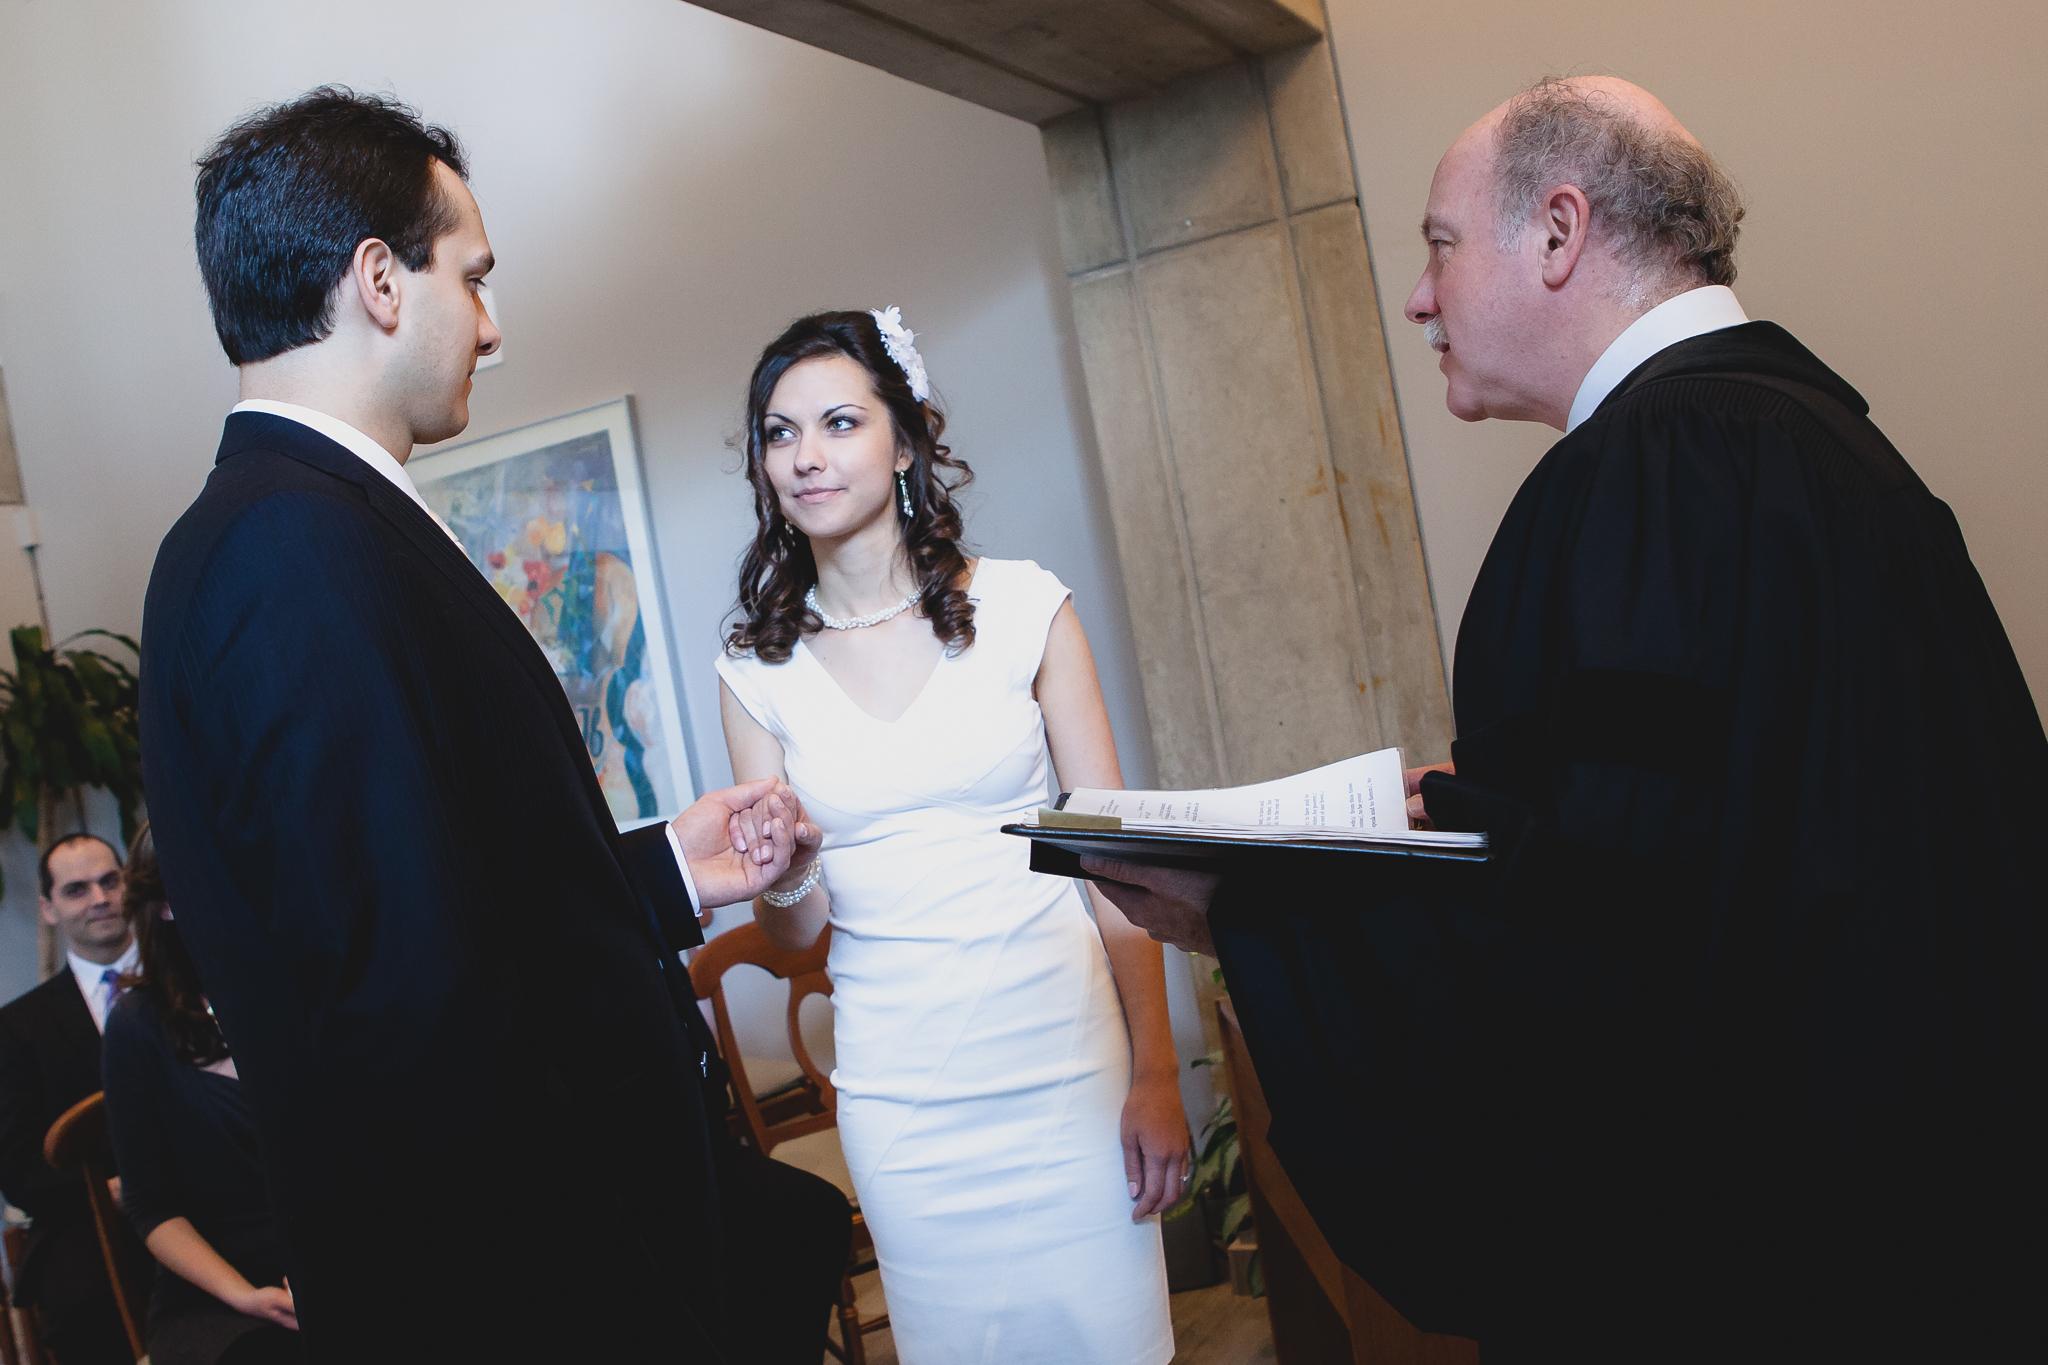 Toronto Wedding Photography - Zoya & Alexei -13.jpg